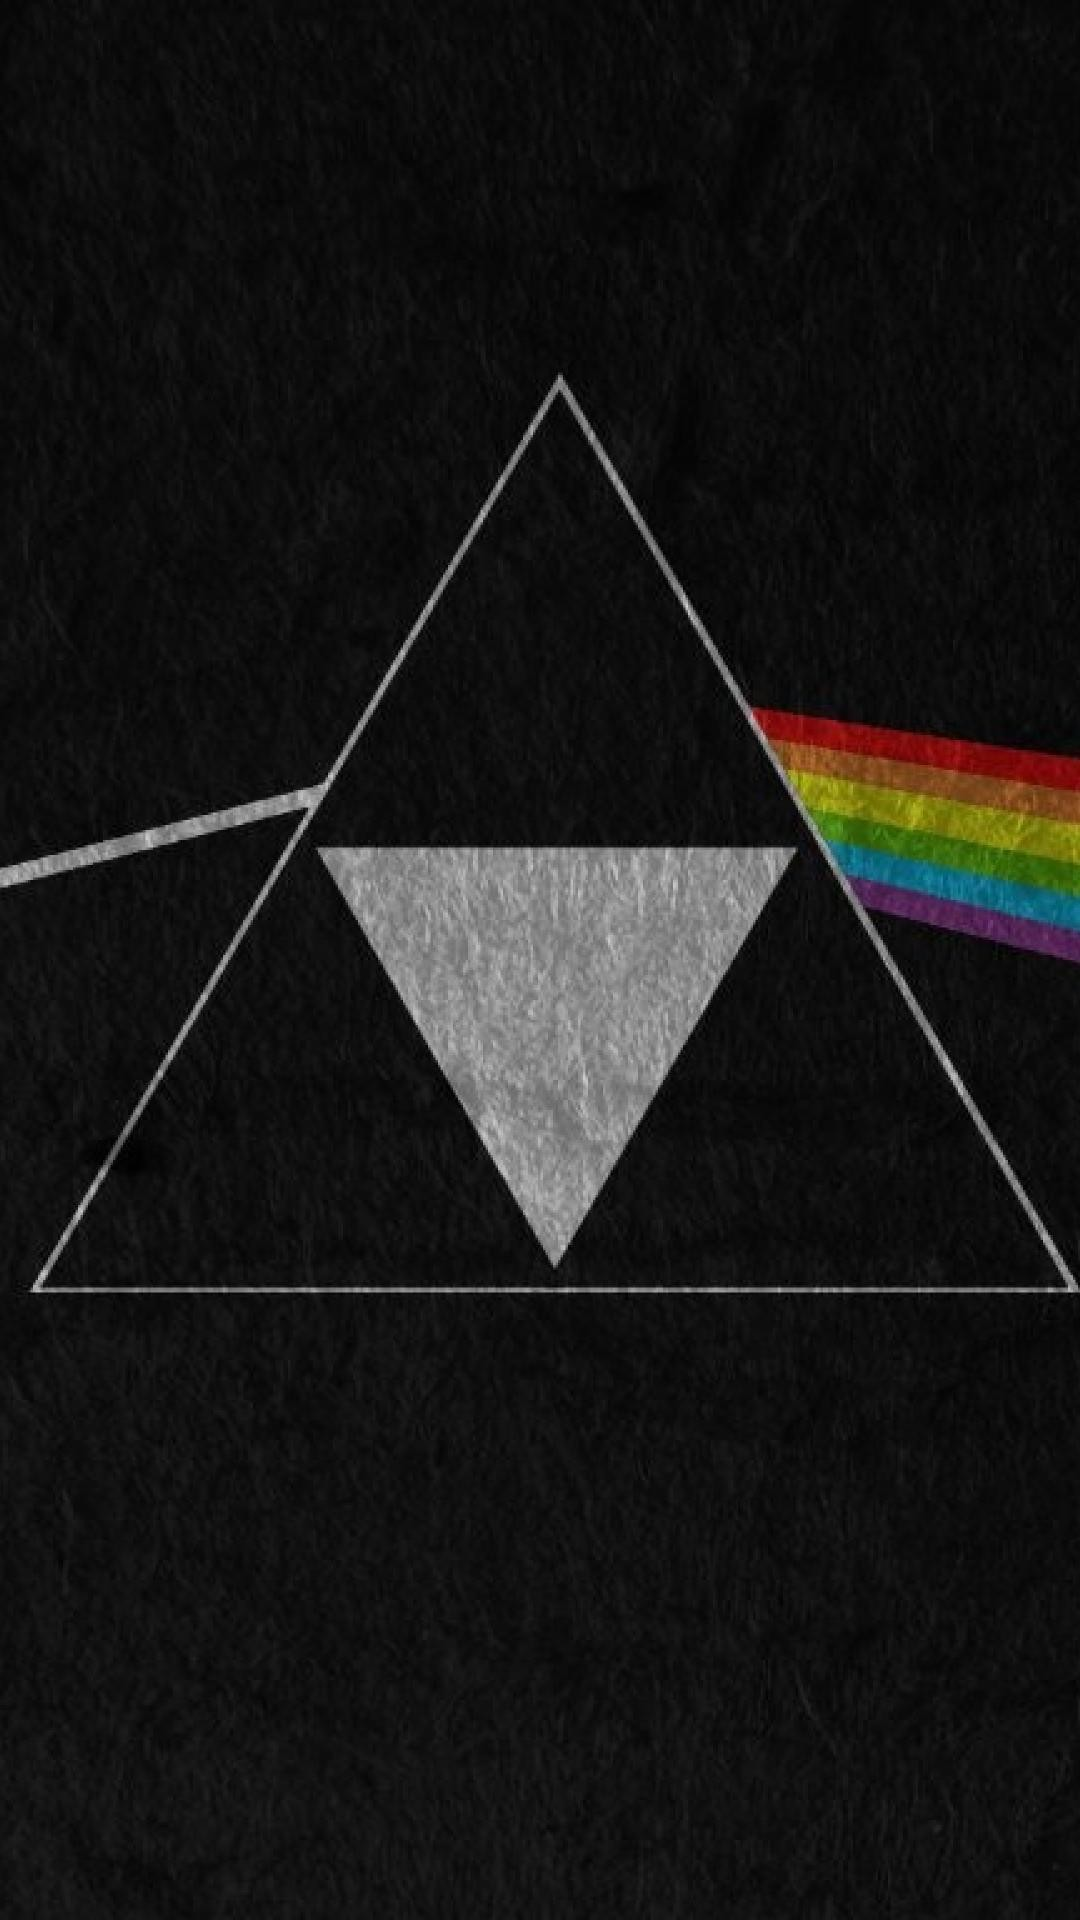 Pink Floyd Wallpapers Screensavers 74 Images